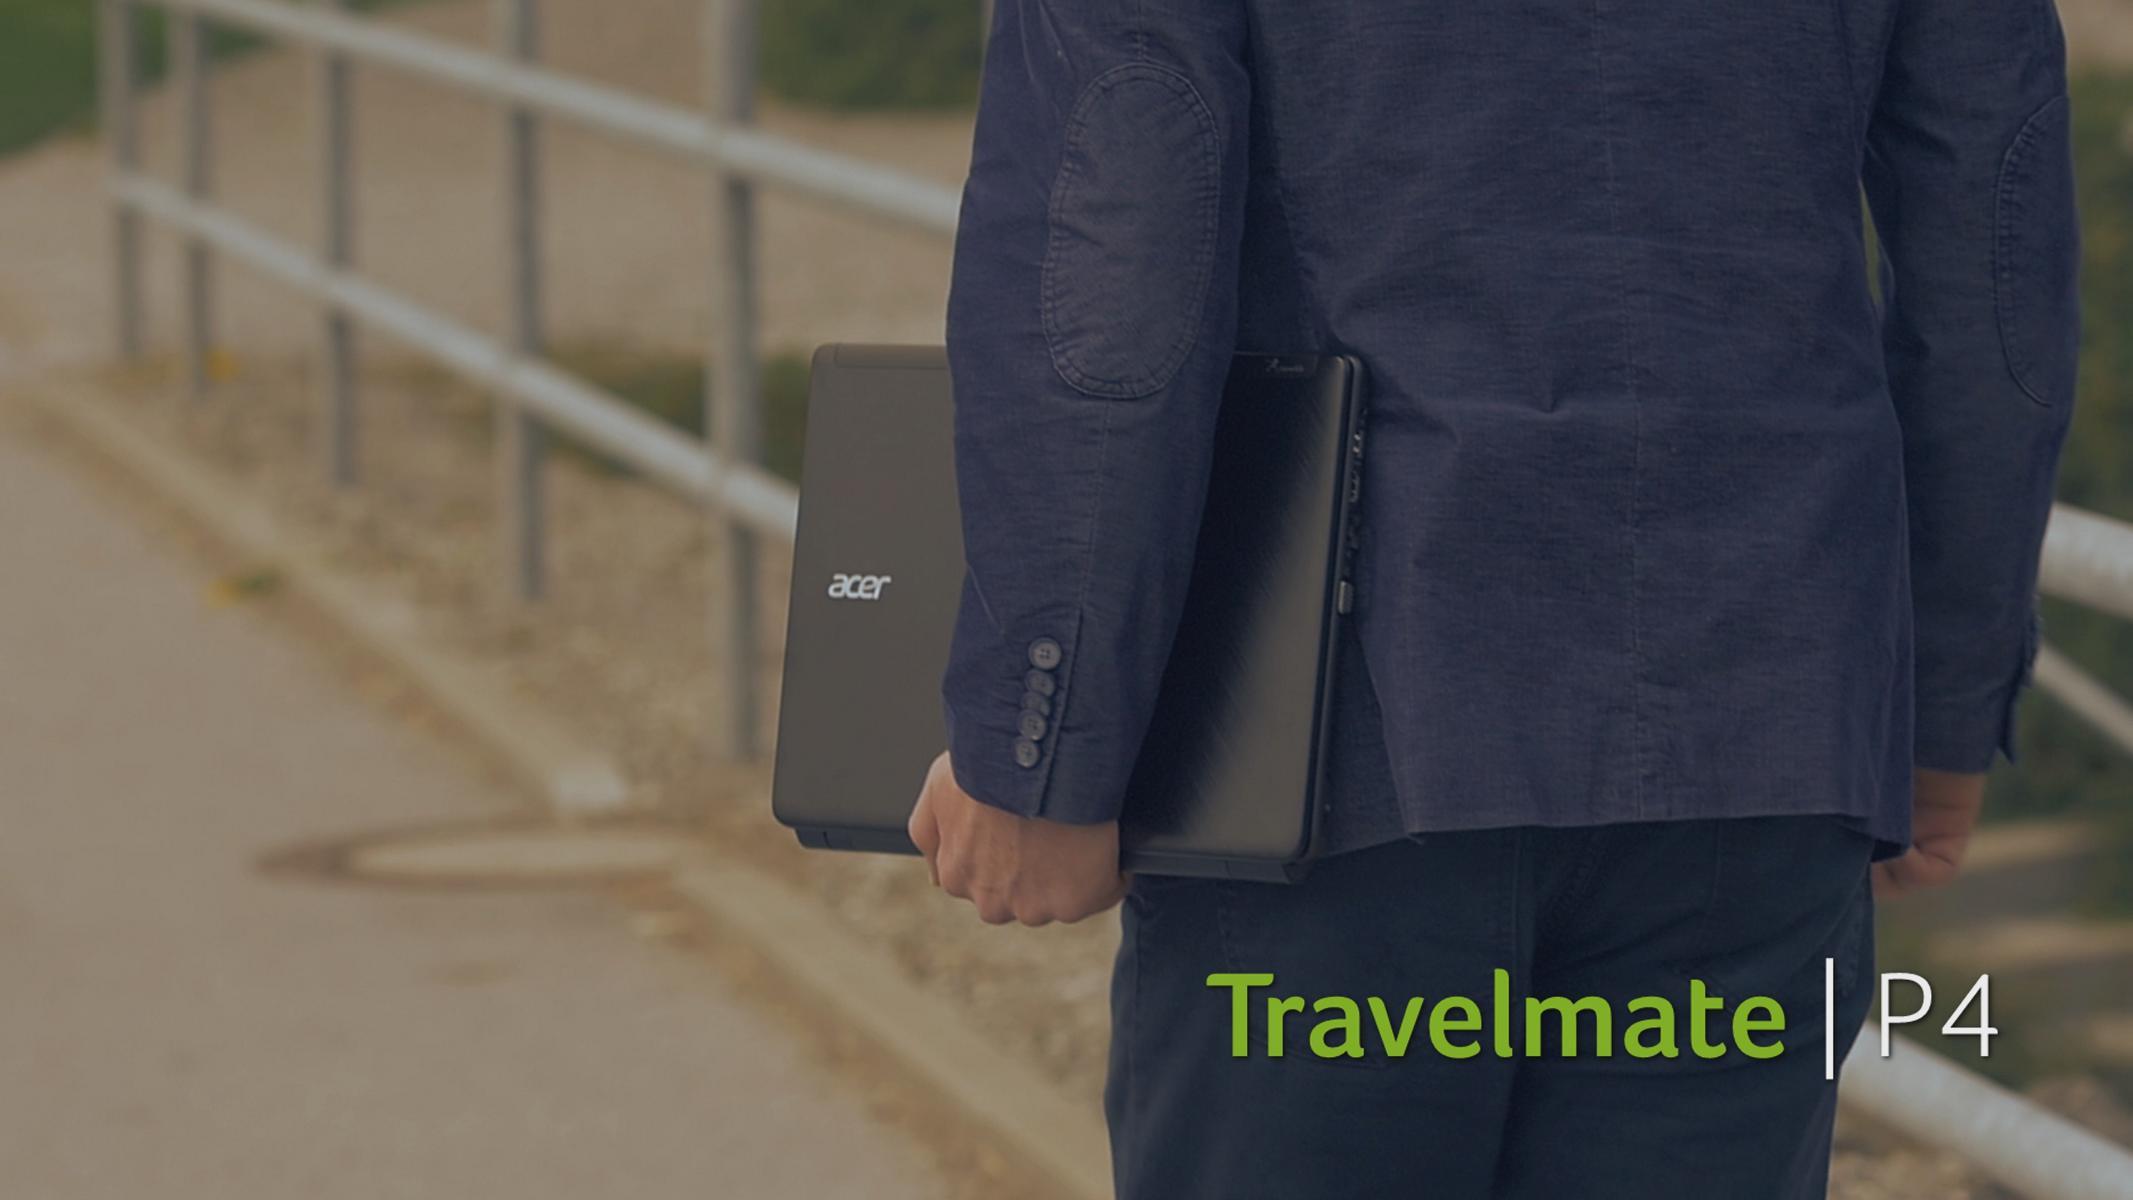 Acer Travelmate P4 Notebooks